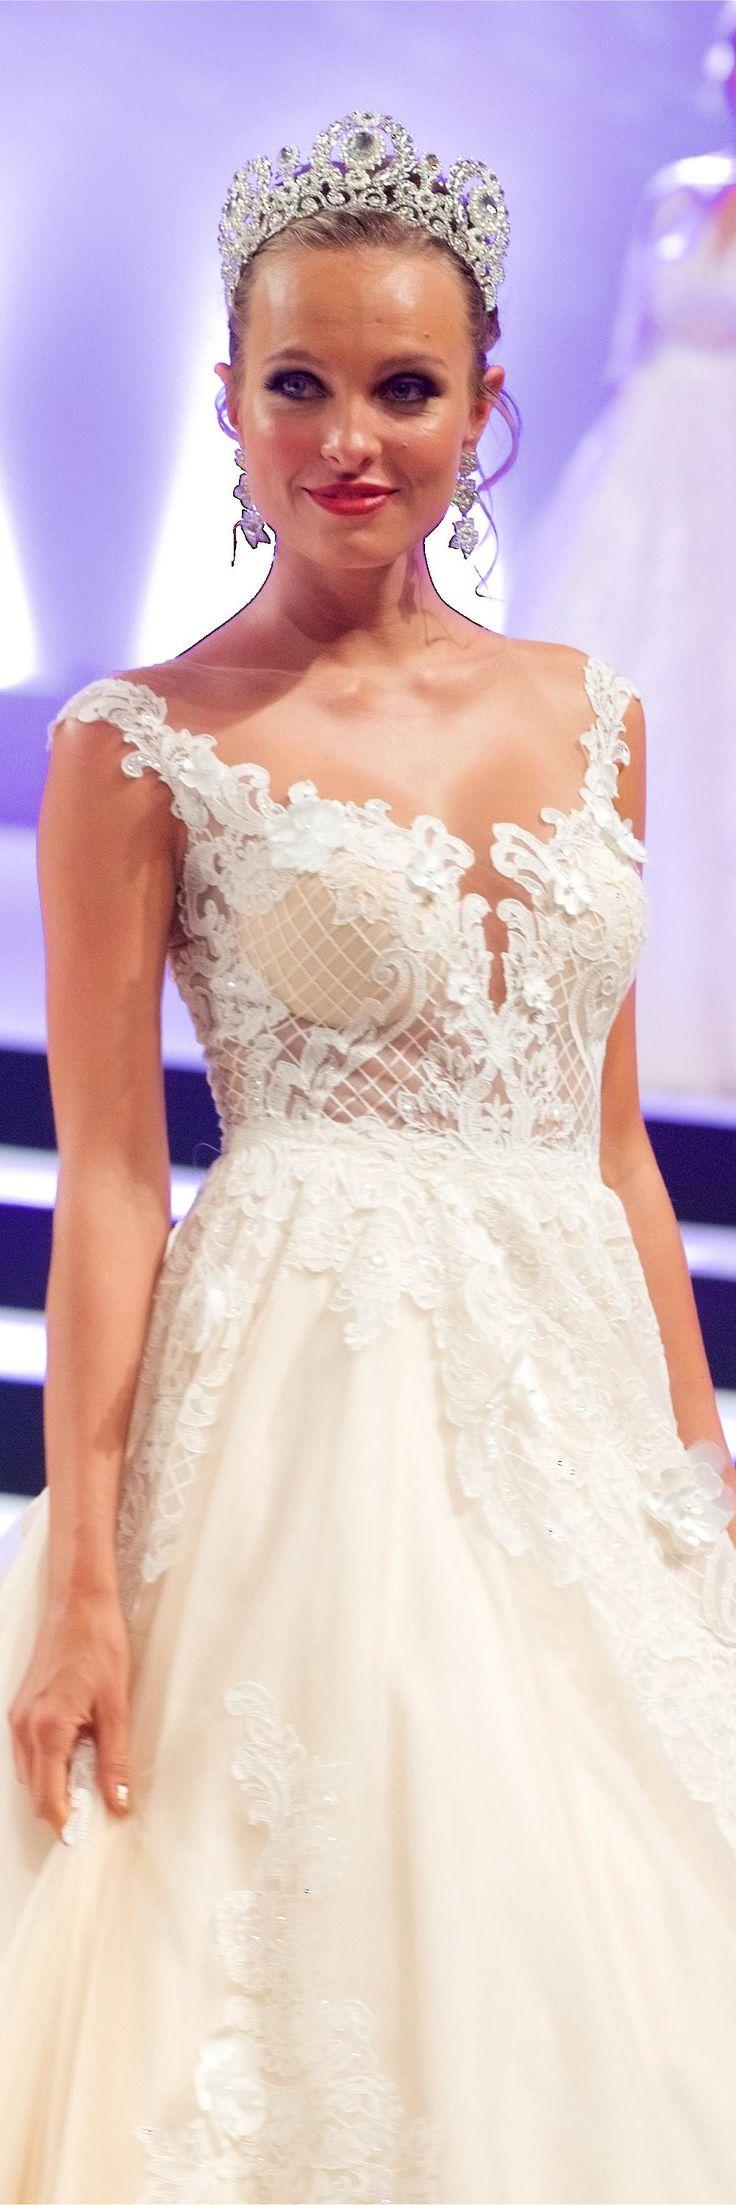 Lovely Designer wedding dresses produktion of Latvia Europe New Collection Julija Bridal Fashion